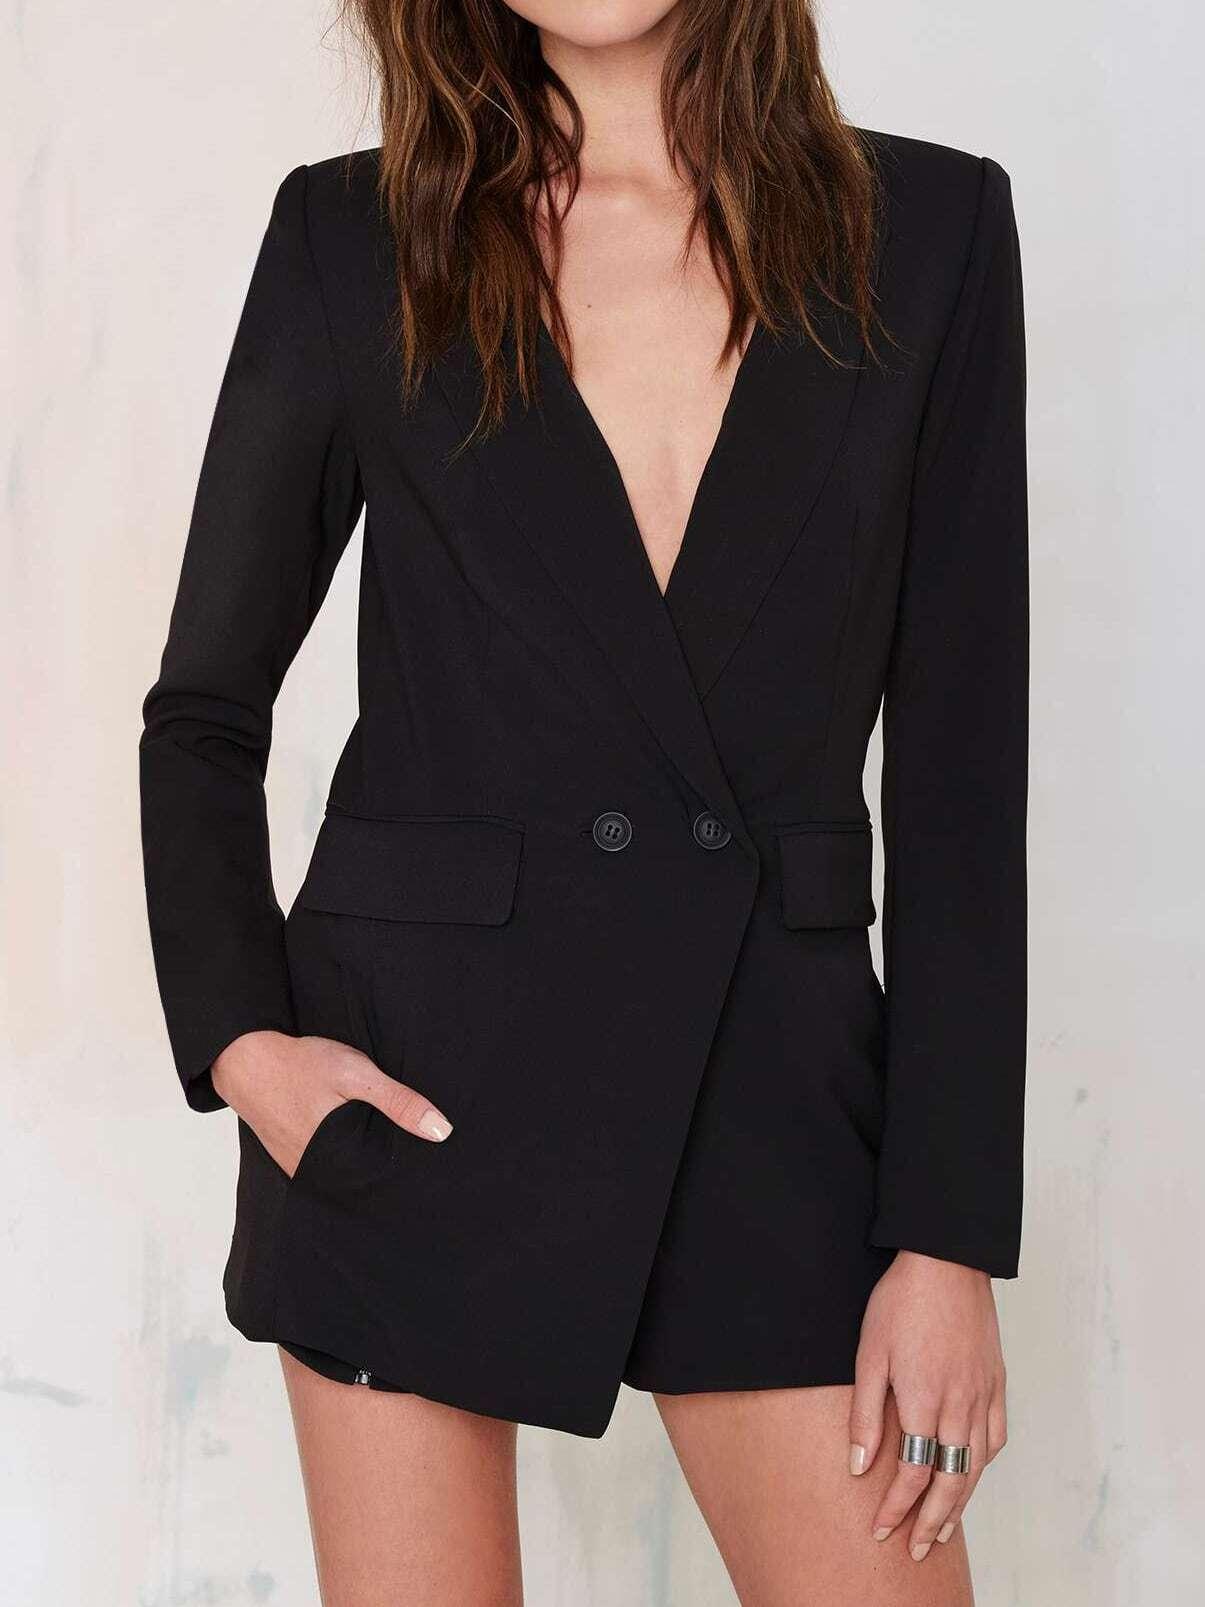 Black Lapel Double Breasted Blazer Jumpsuit